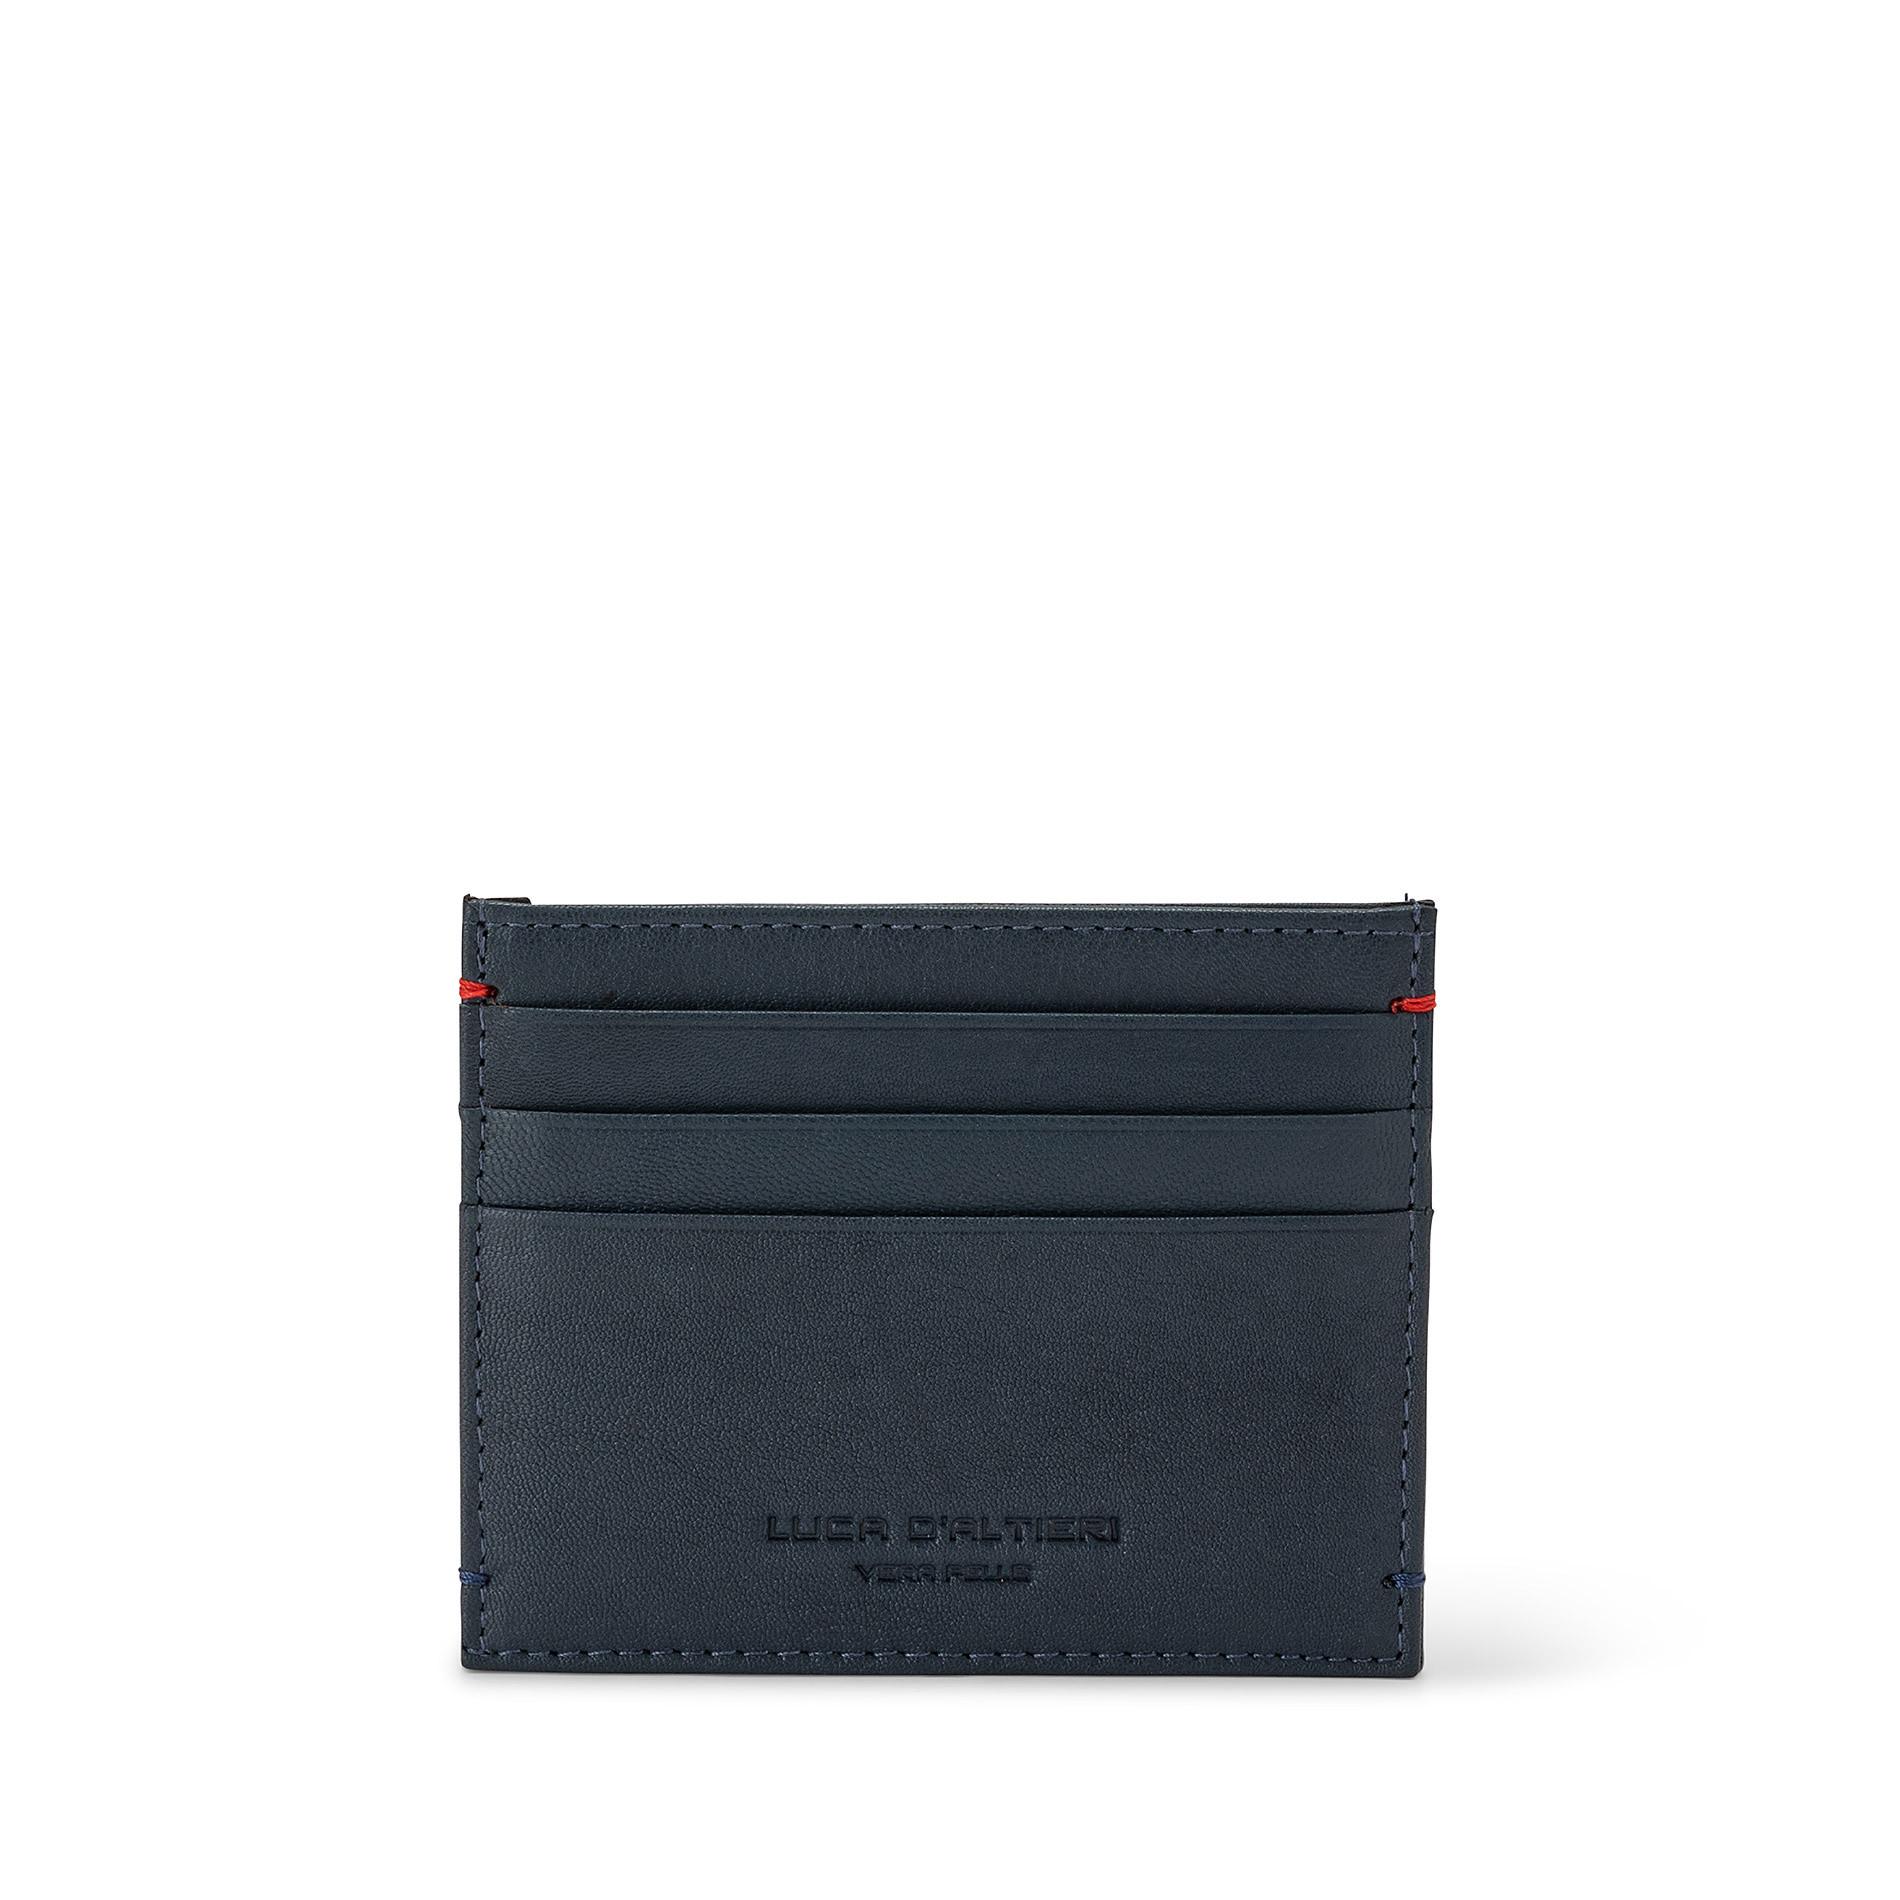 Porta carte di credito in pelle Luca D'Altieri, Blu, large image number 0